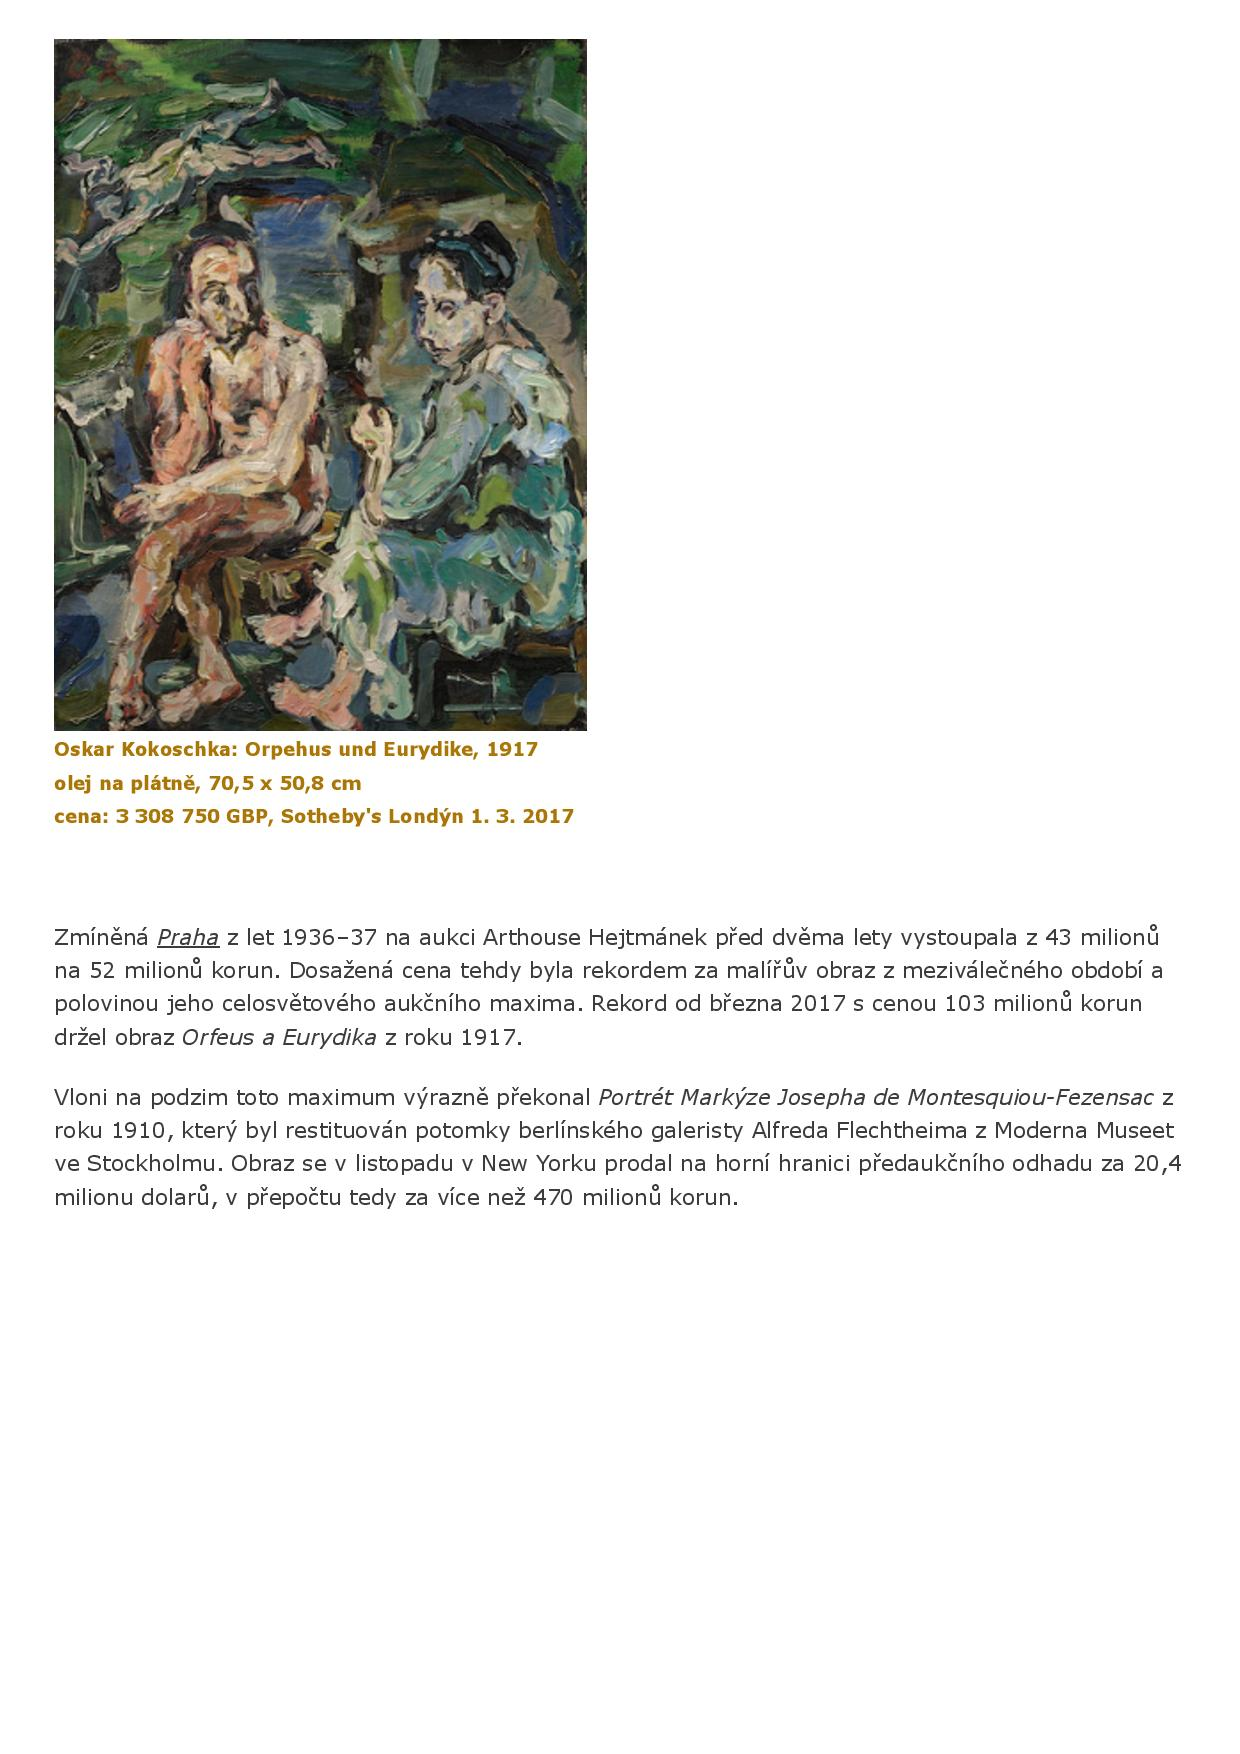 Artplus.cz, 24/10/2019, 3/6